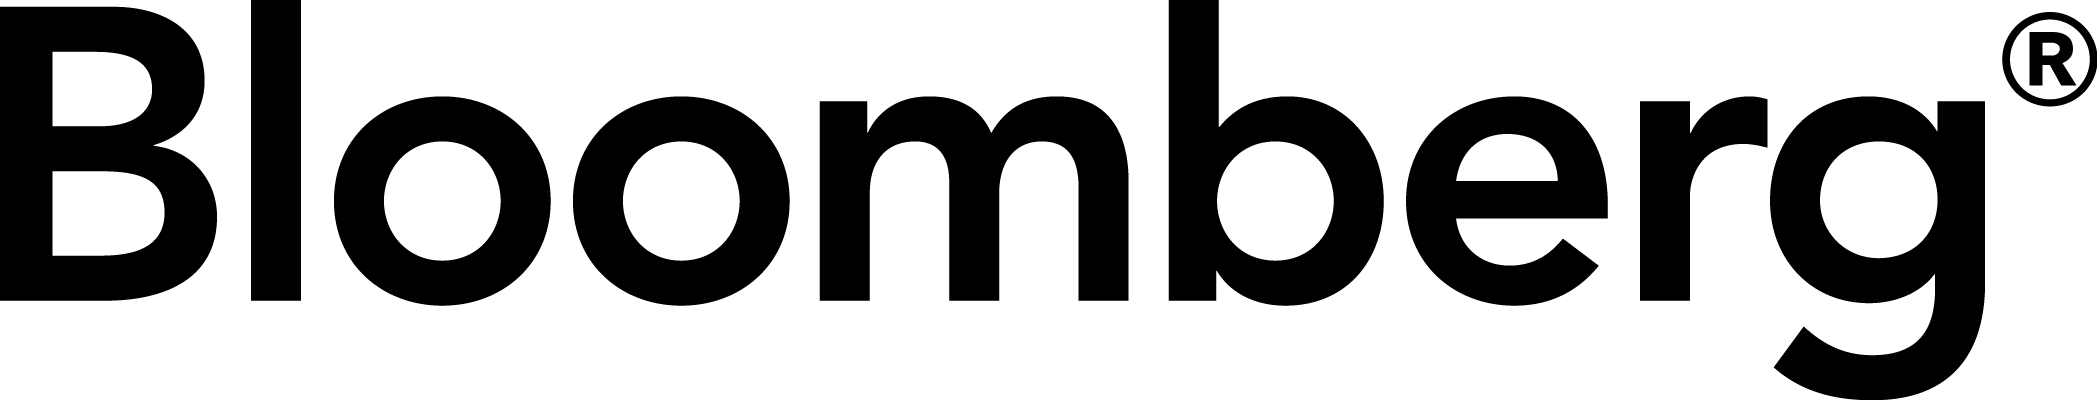 Bloomberg's logo